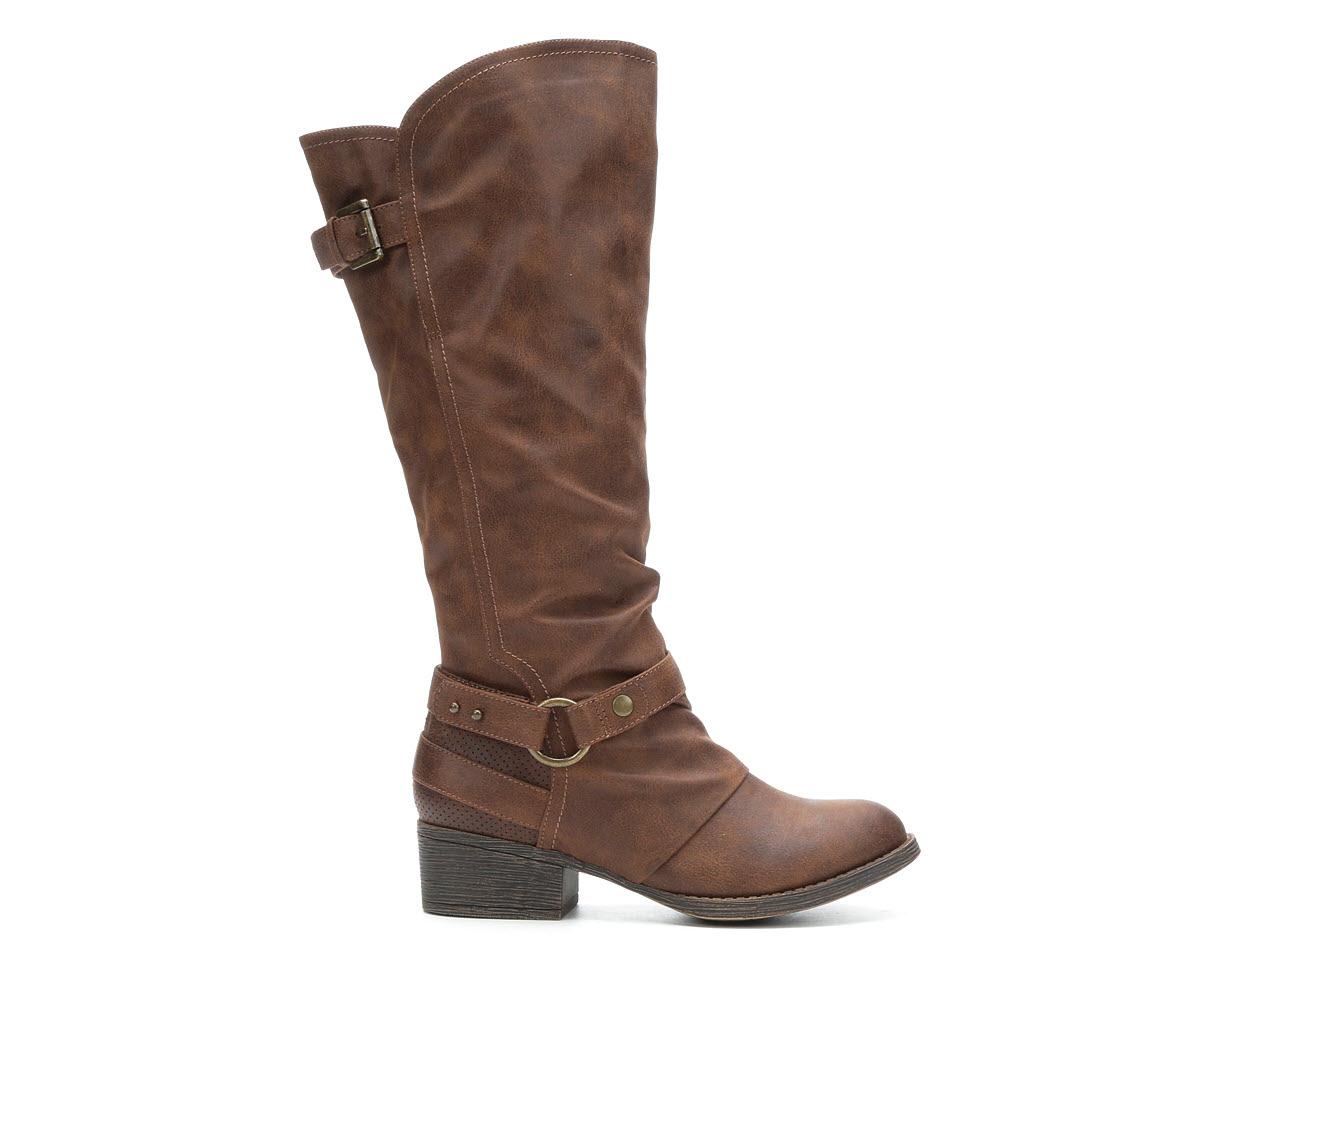 Sugar Danty Women's Boots (Brown - Canvas)